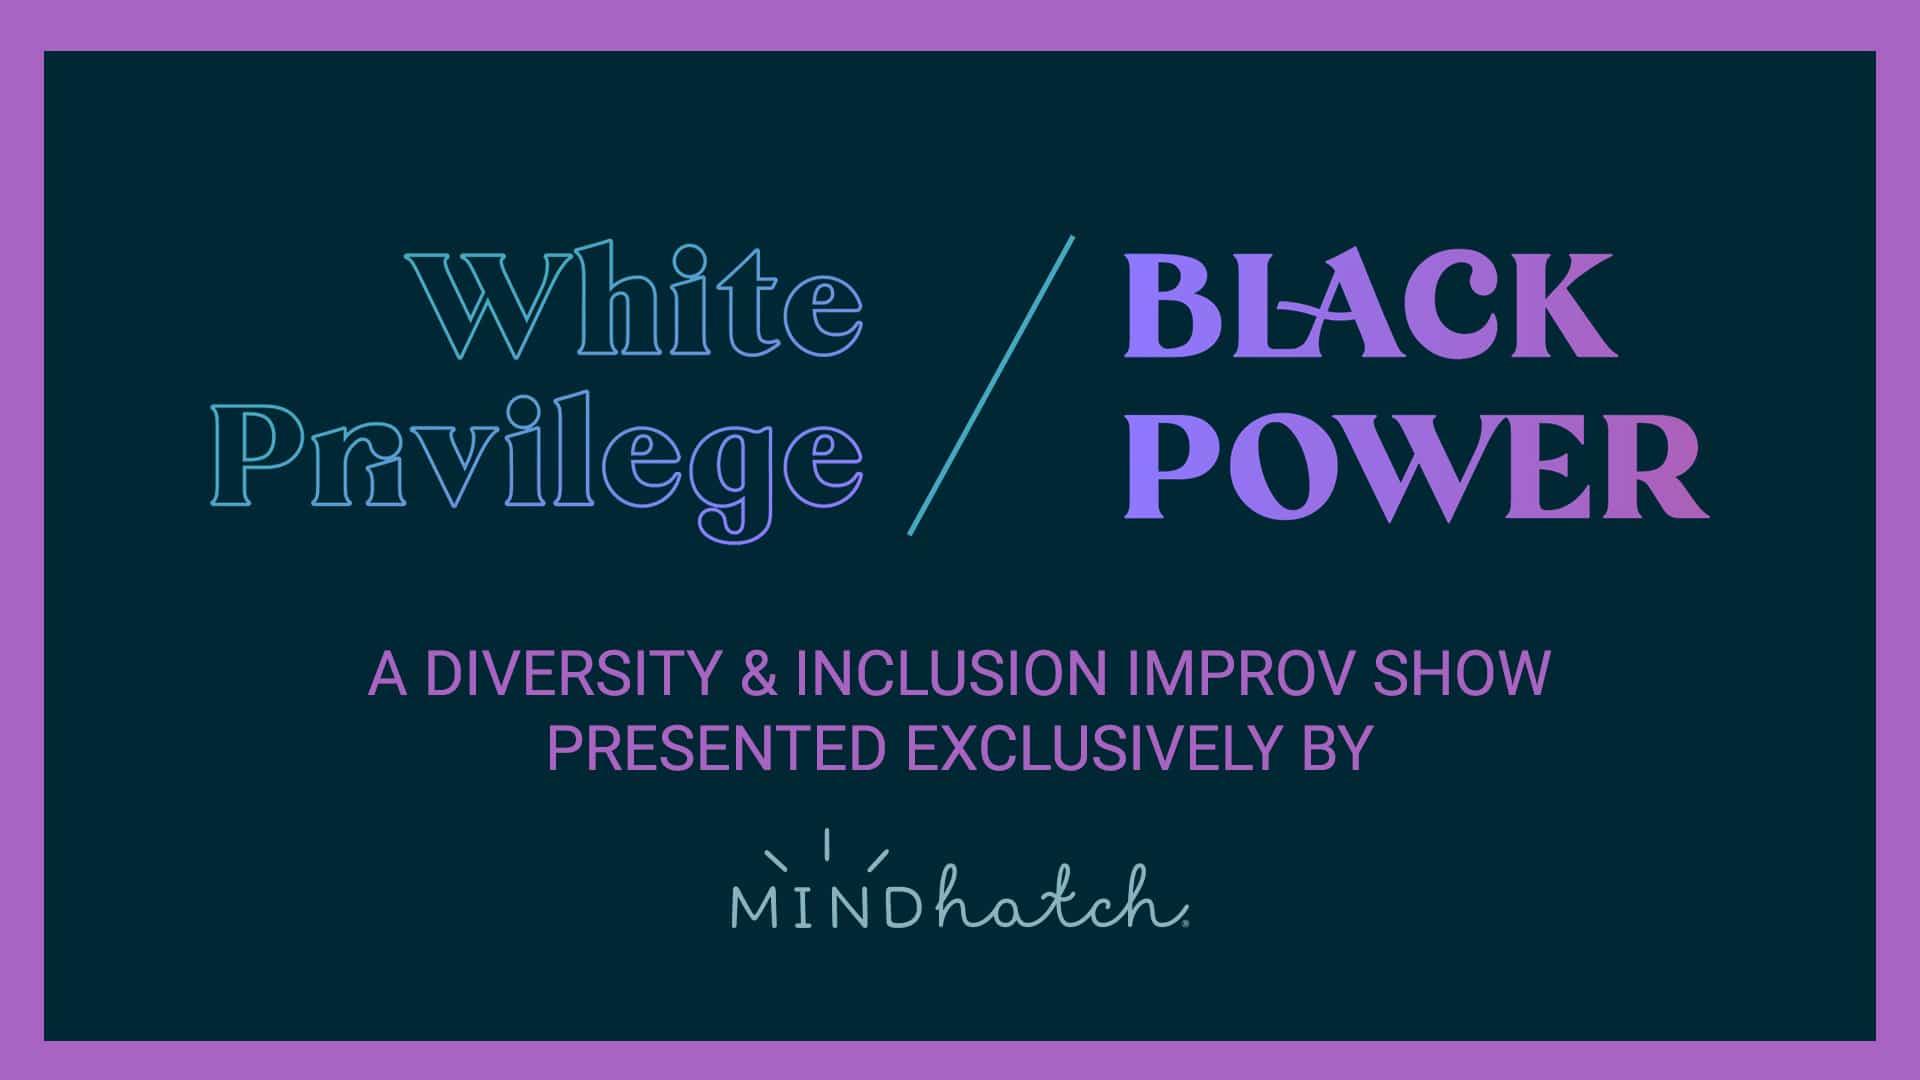 White Privilege, Black Power